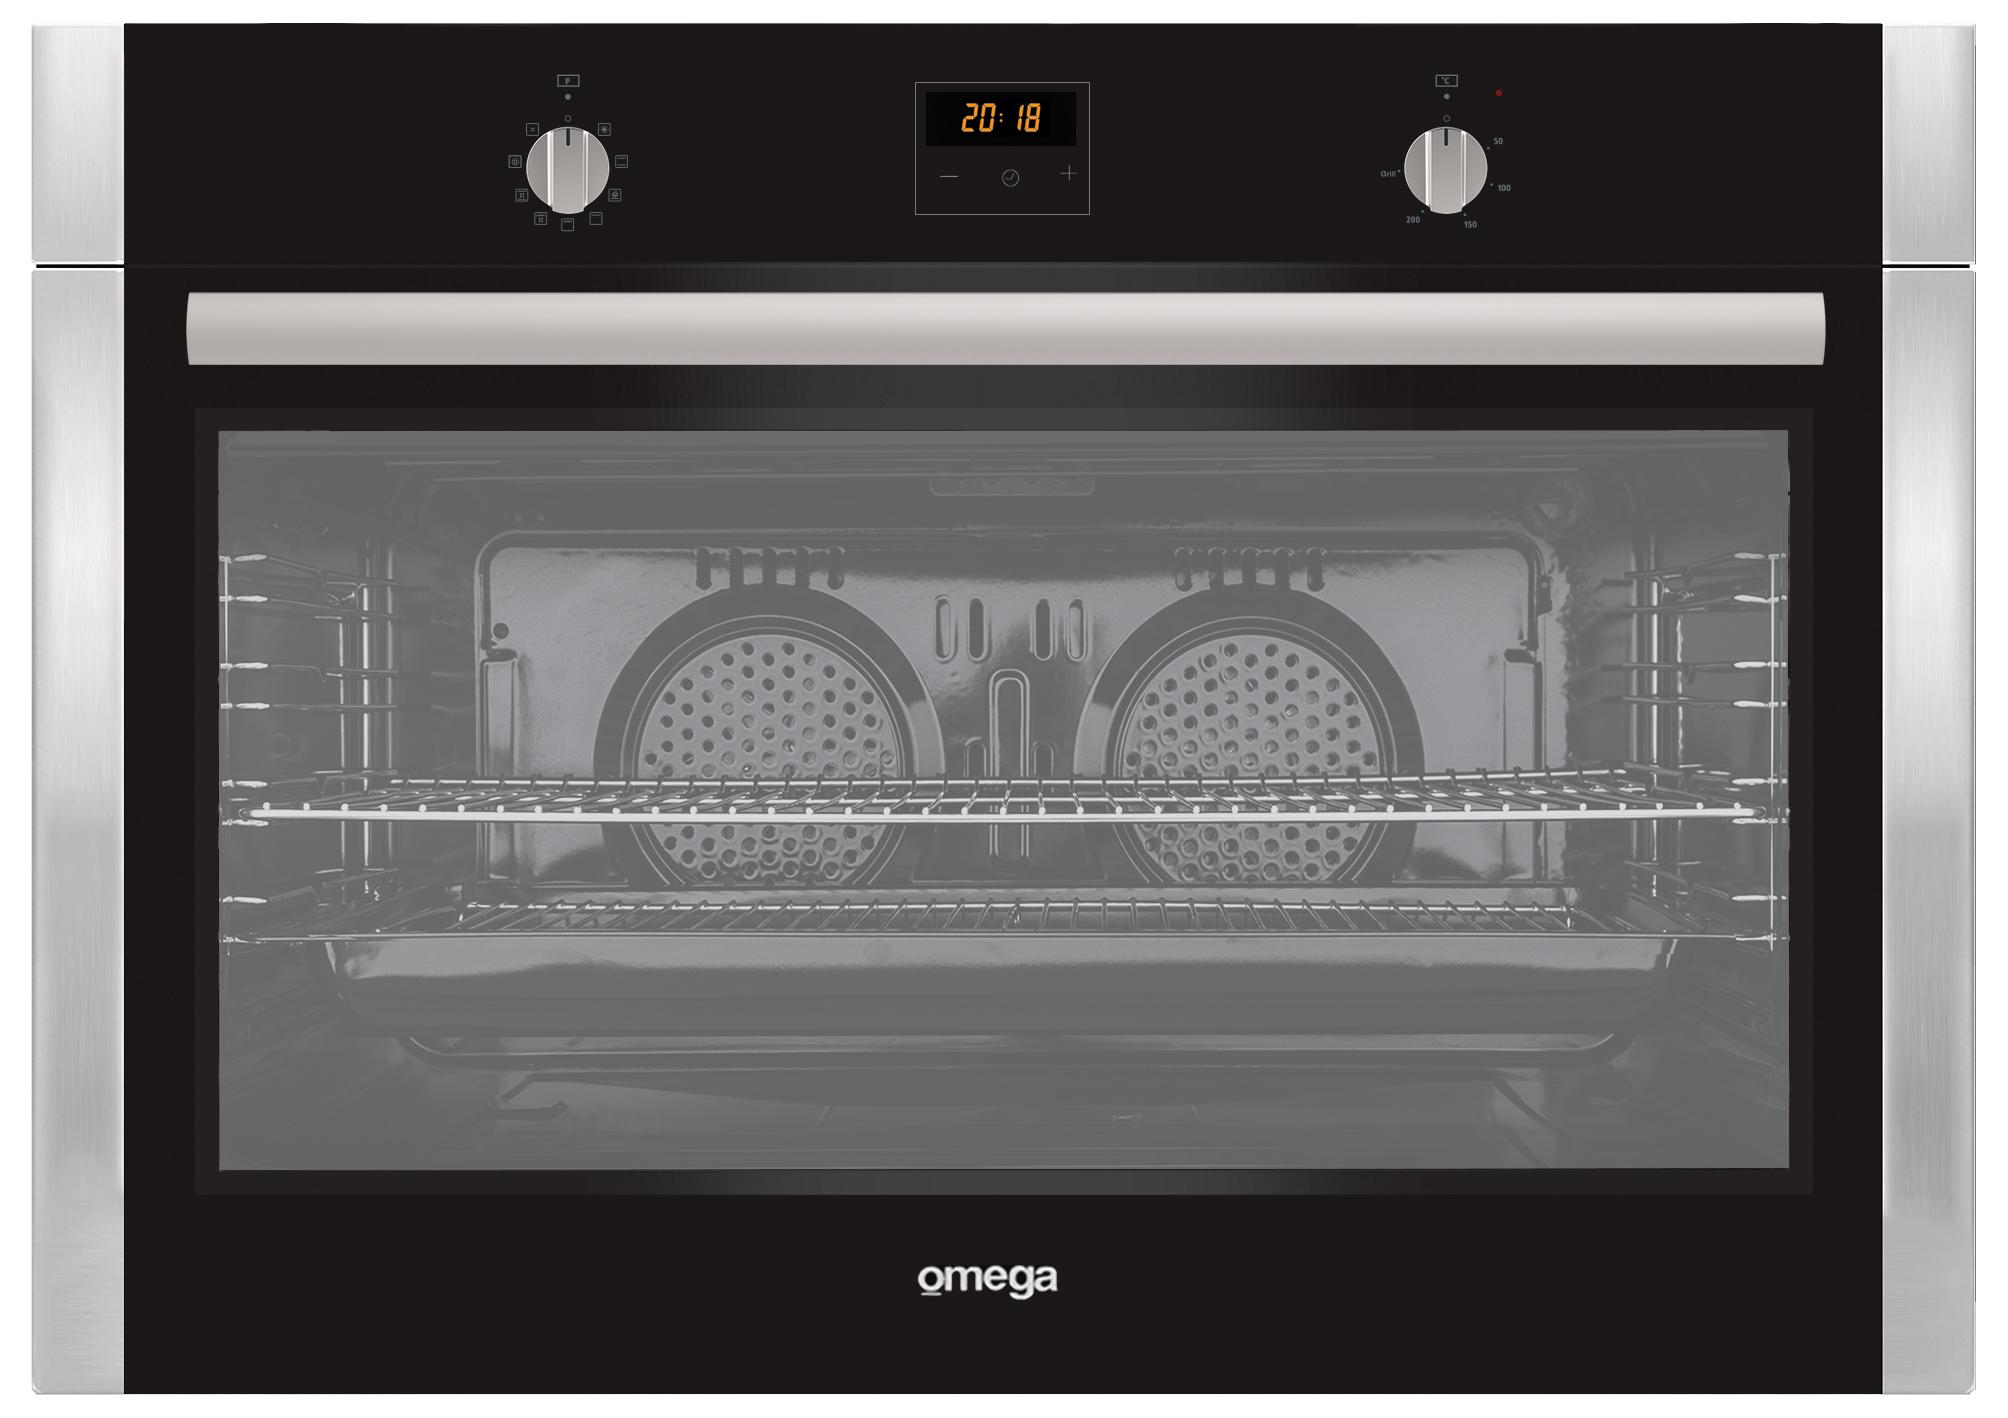 Studio Solari 9 Function Oven